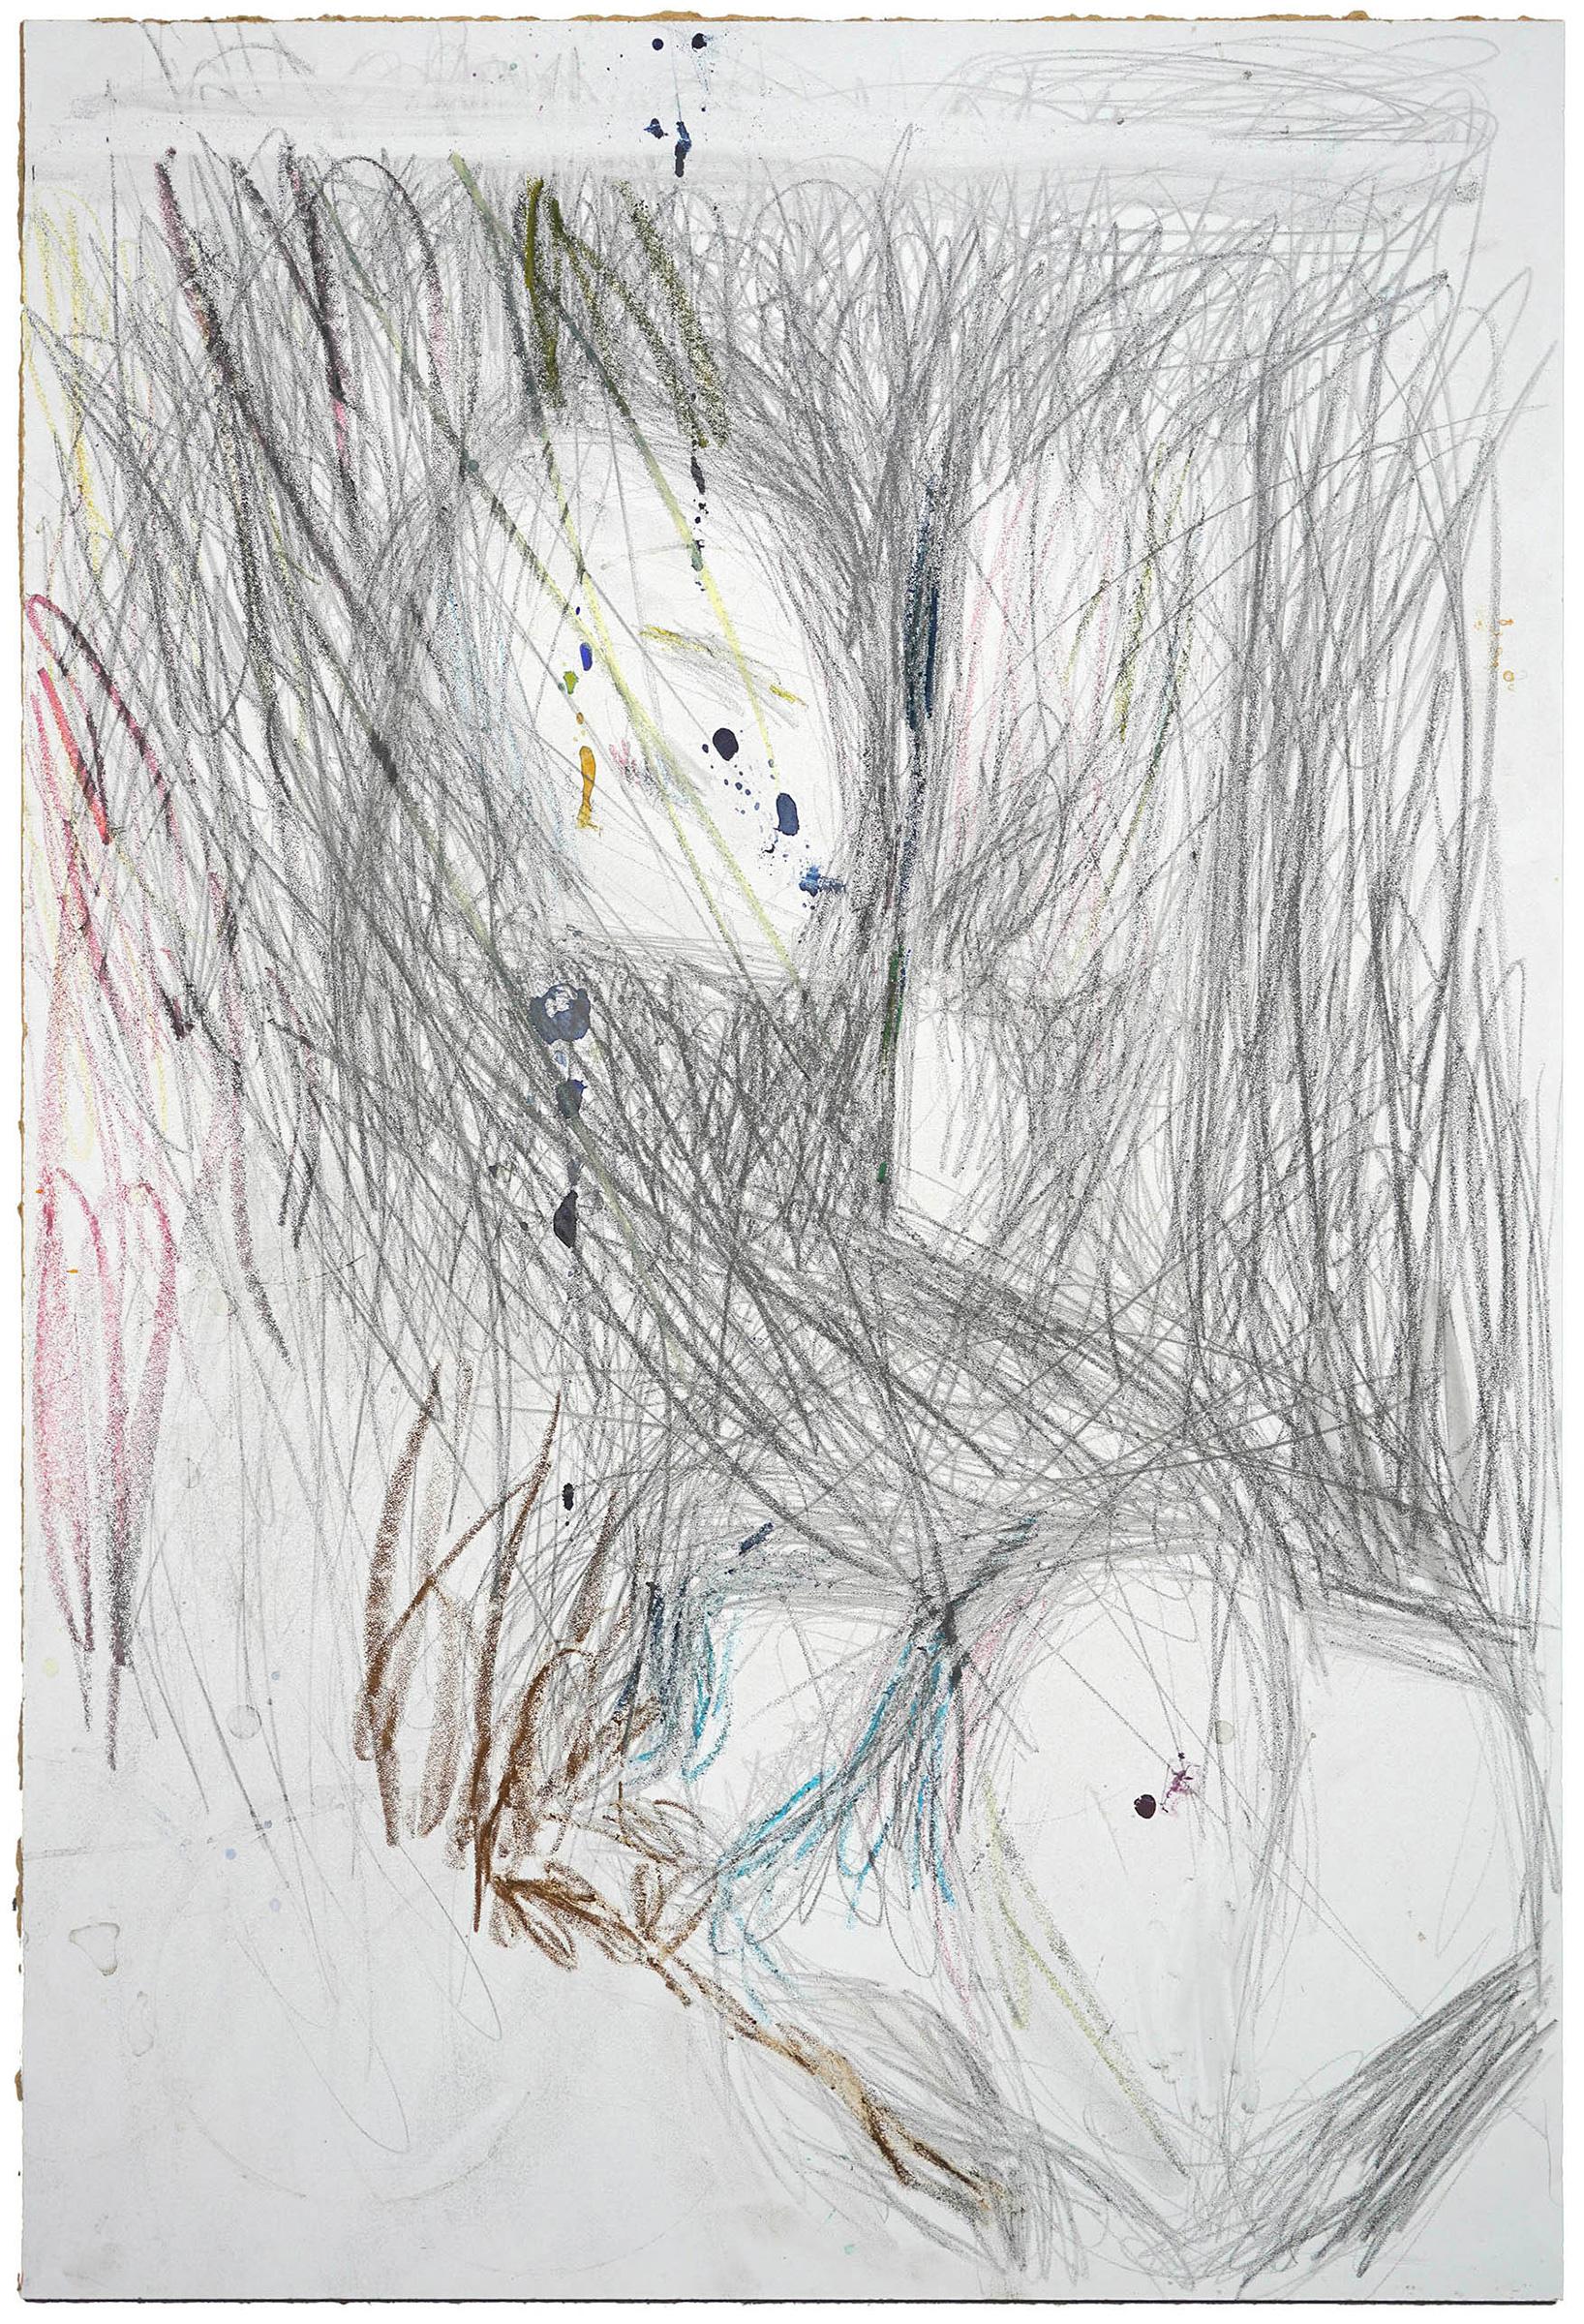 Galerie Barbara Thumm \ Martin Dammann – H Zeichnung 2d (MDa-20-018) \ H Drawing 2d (2020)